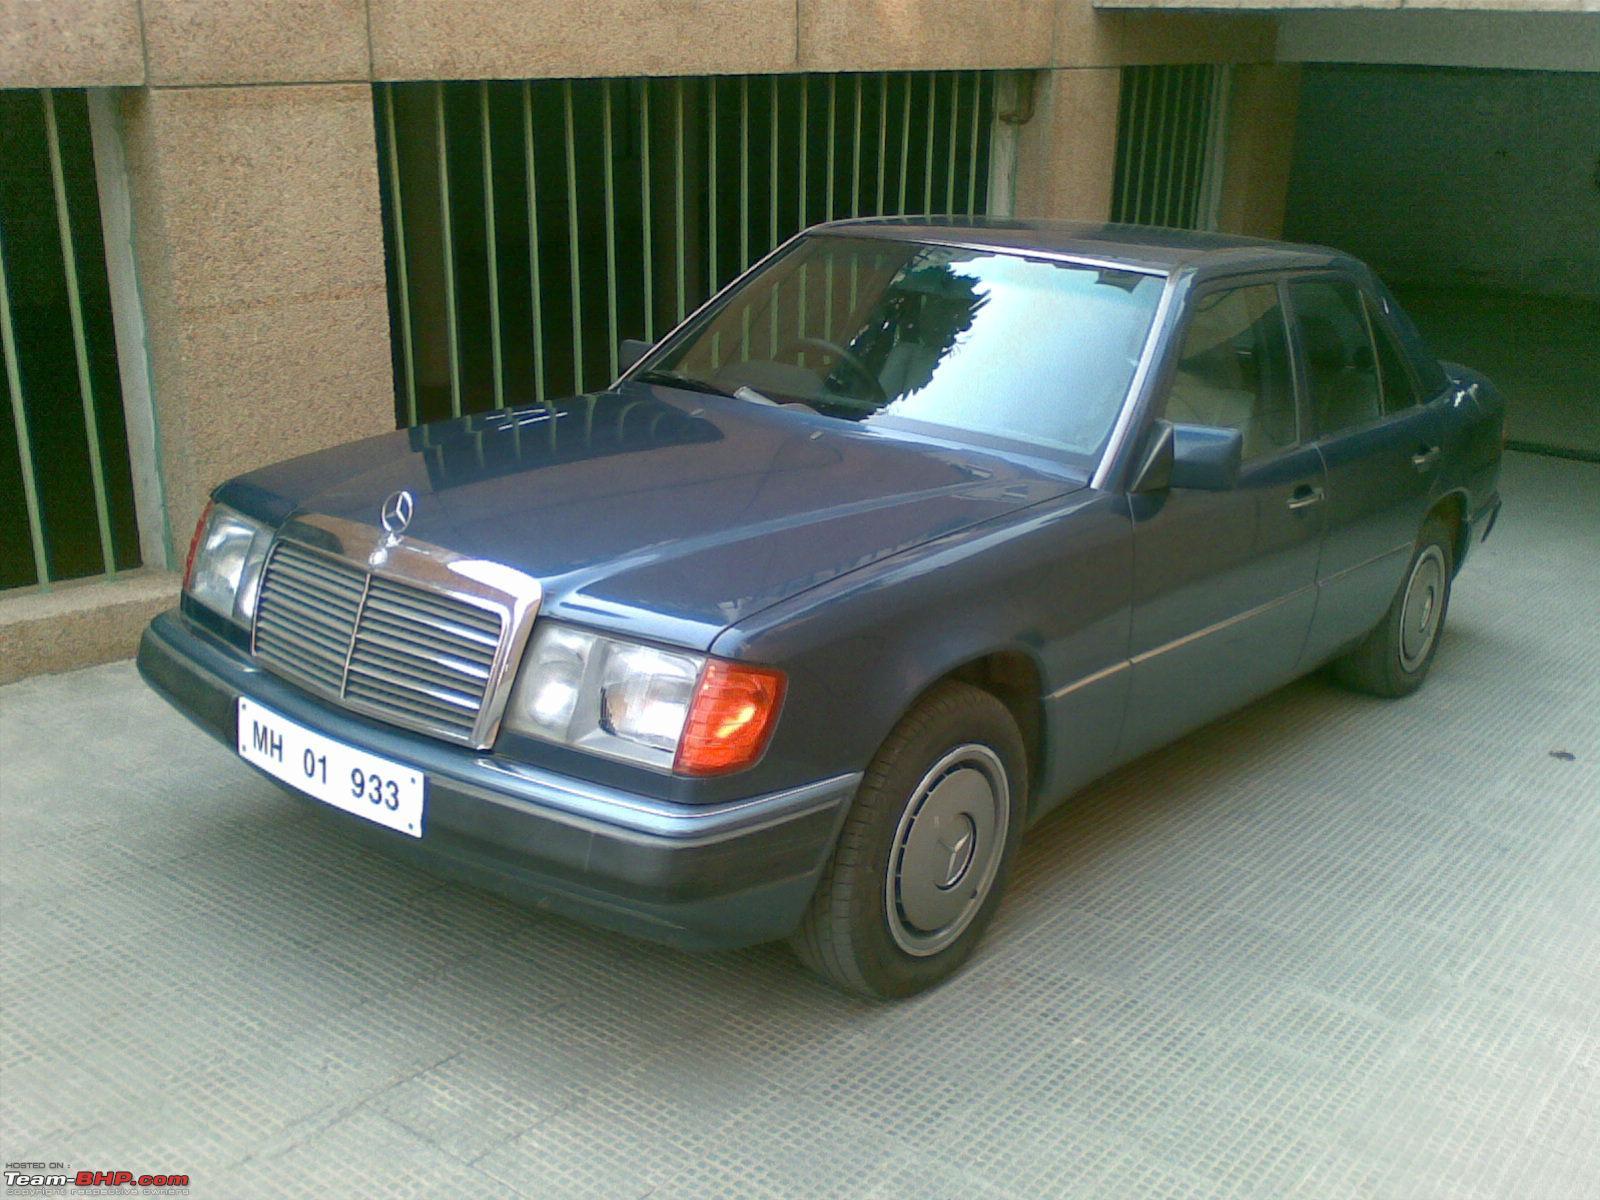 Need AMG replica Alloys For My 1989 Mercedes W124 - Team-BHP